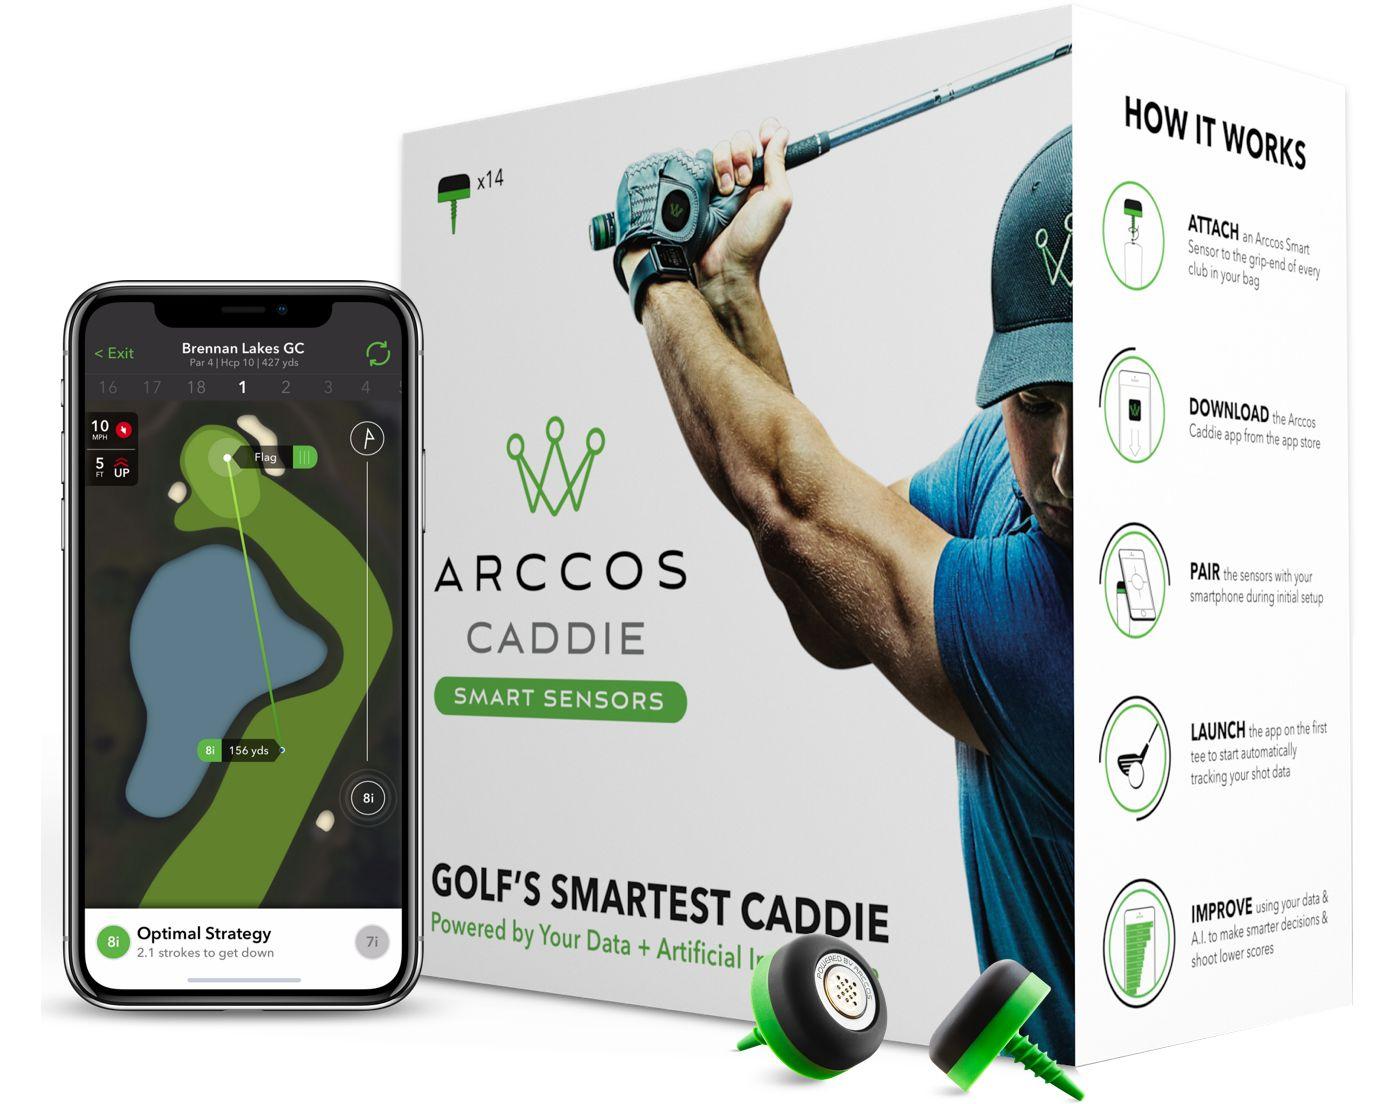 Arccos Caddie Smart Sensor Golf Performance Tracking System